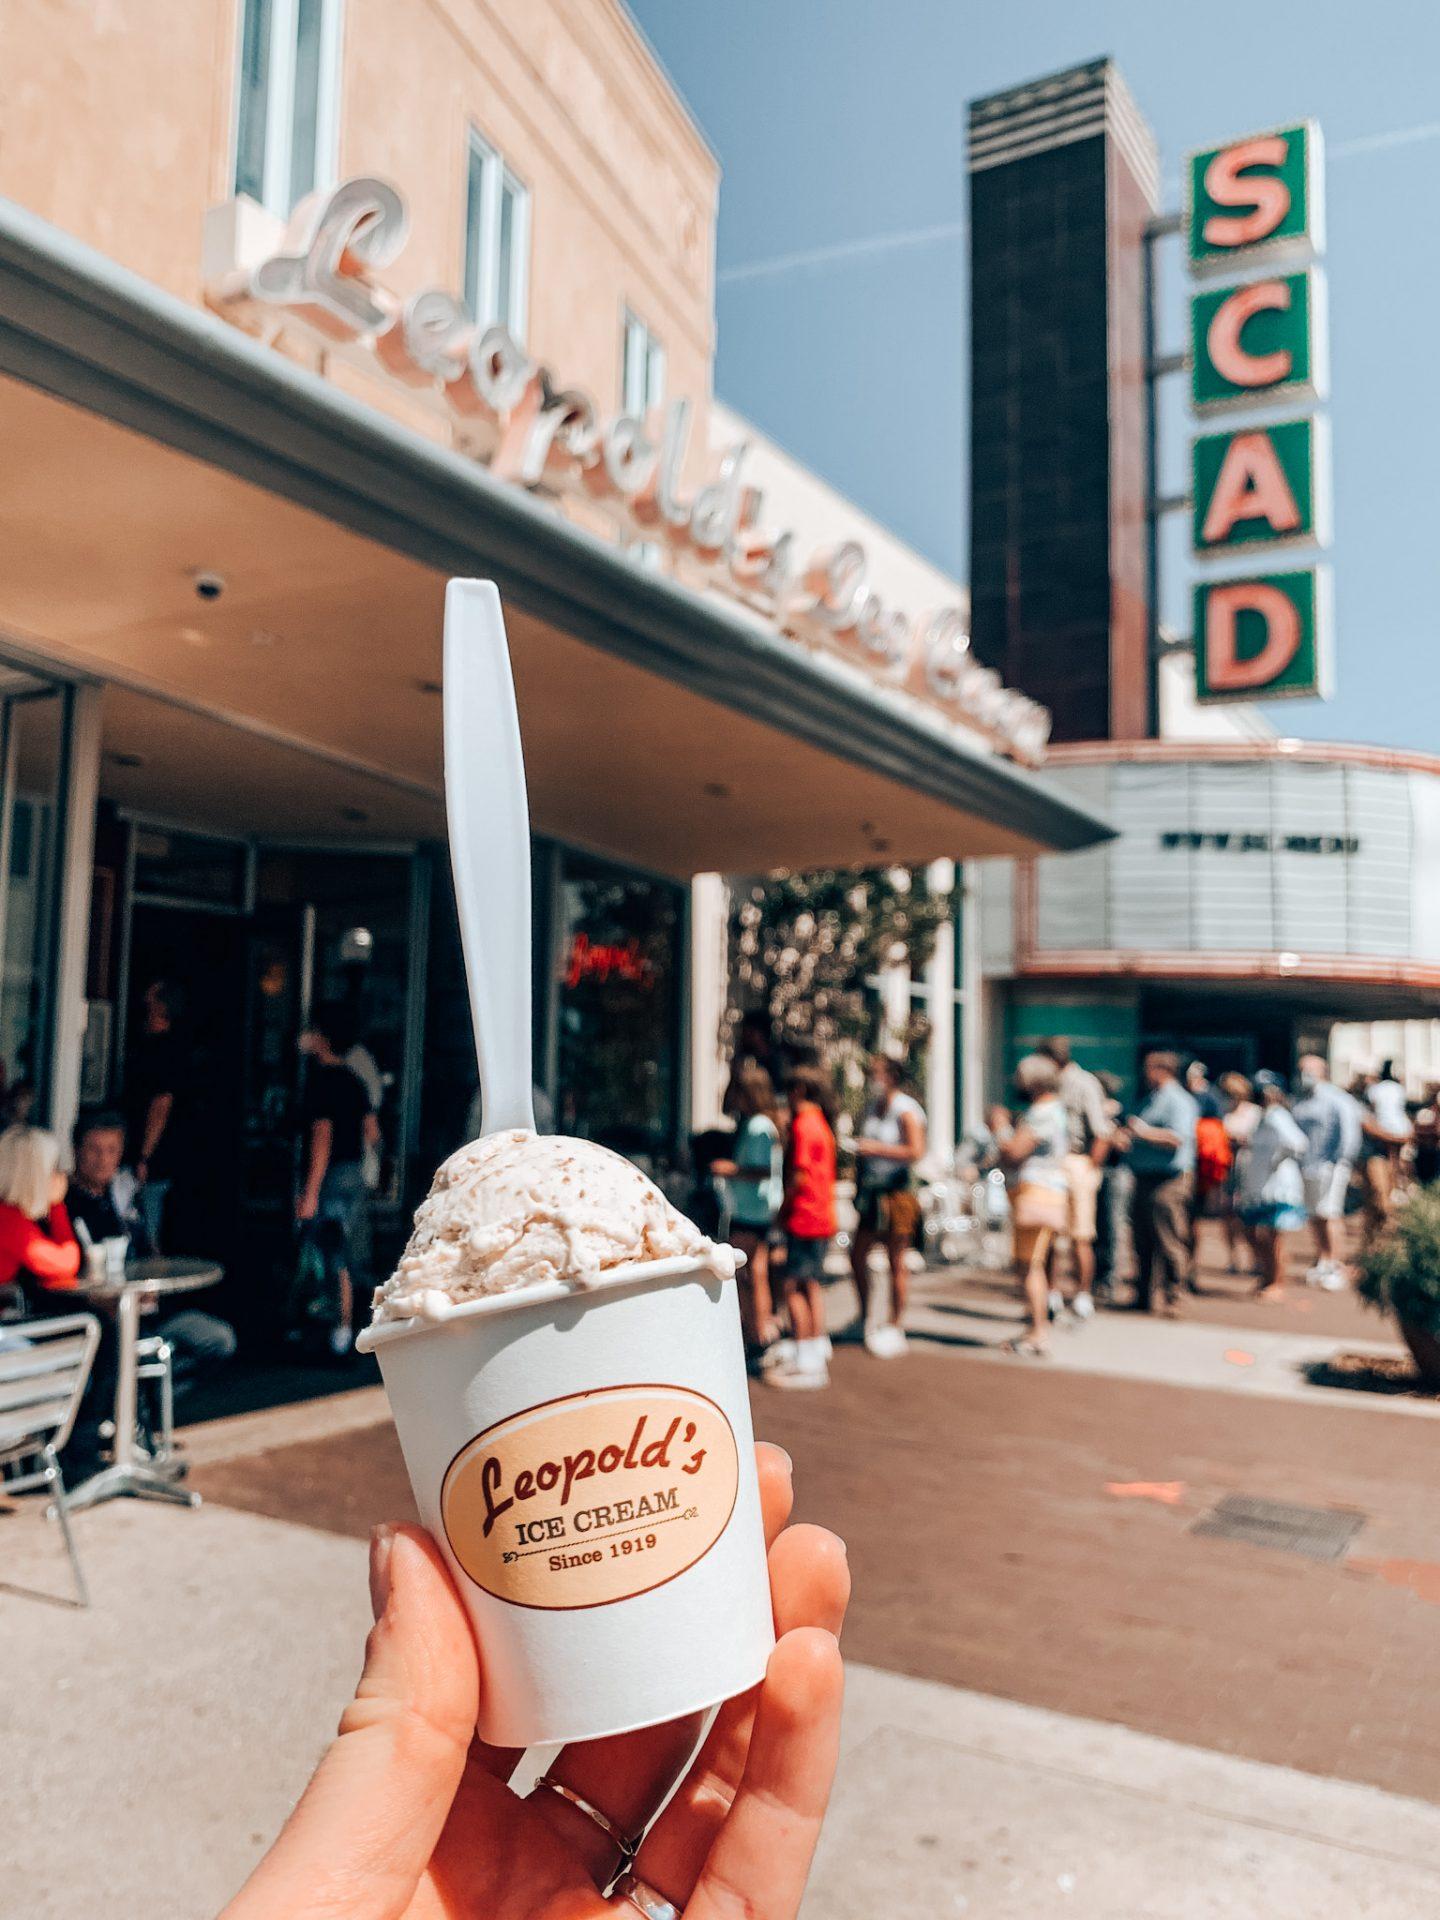 Leopold's Ice Cream during 2 days in Savannah, Georgia